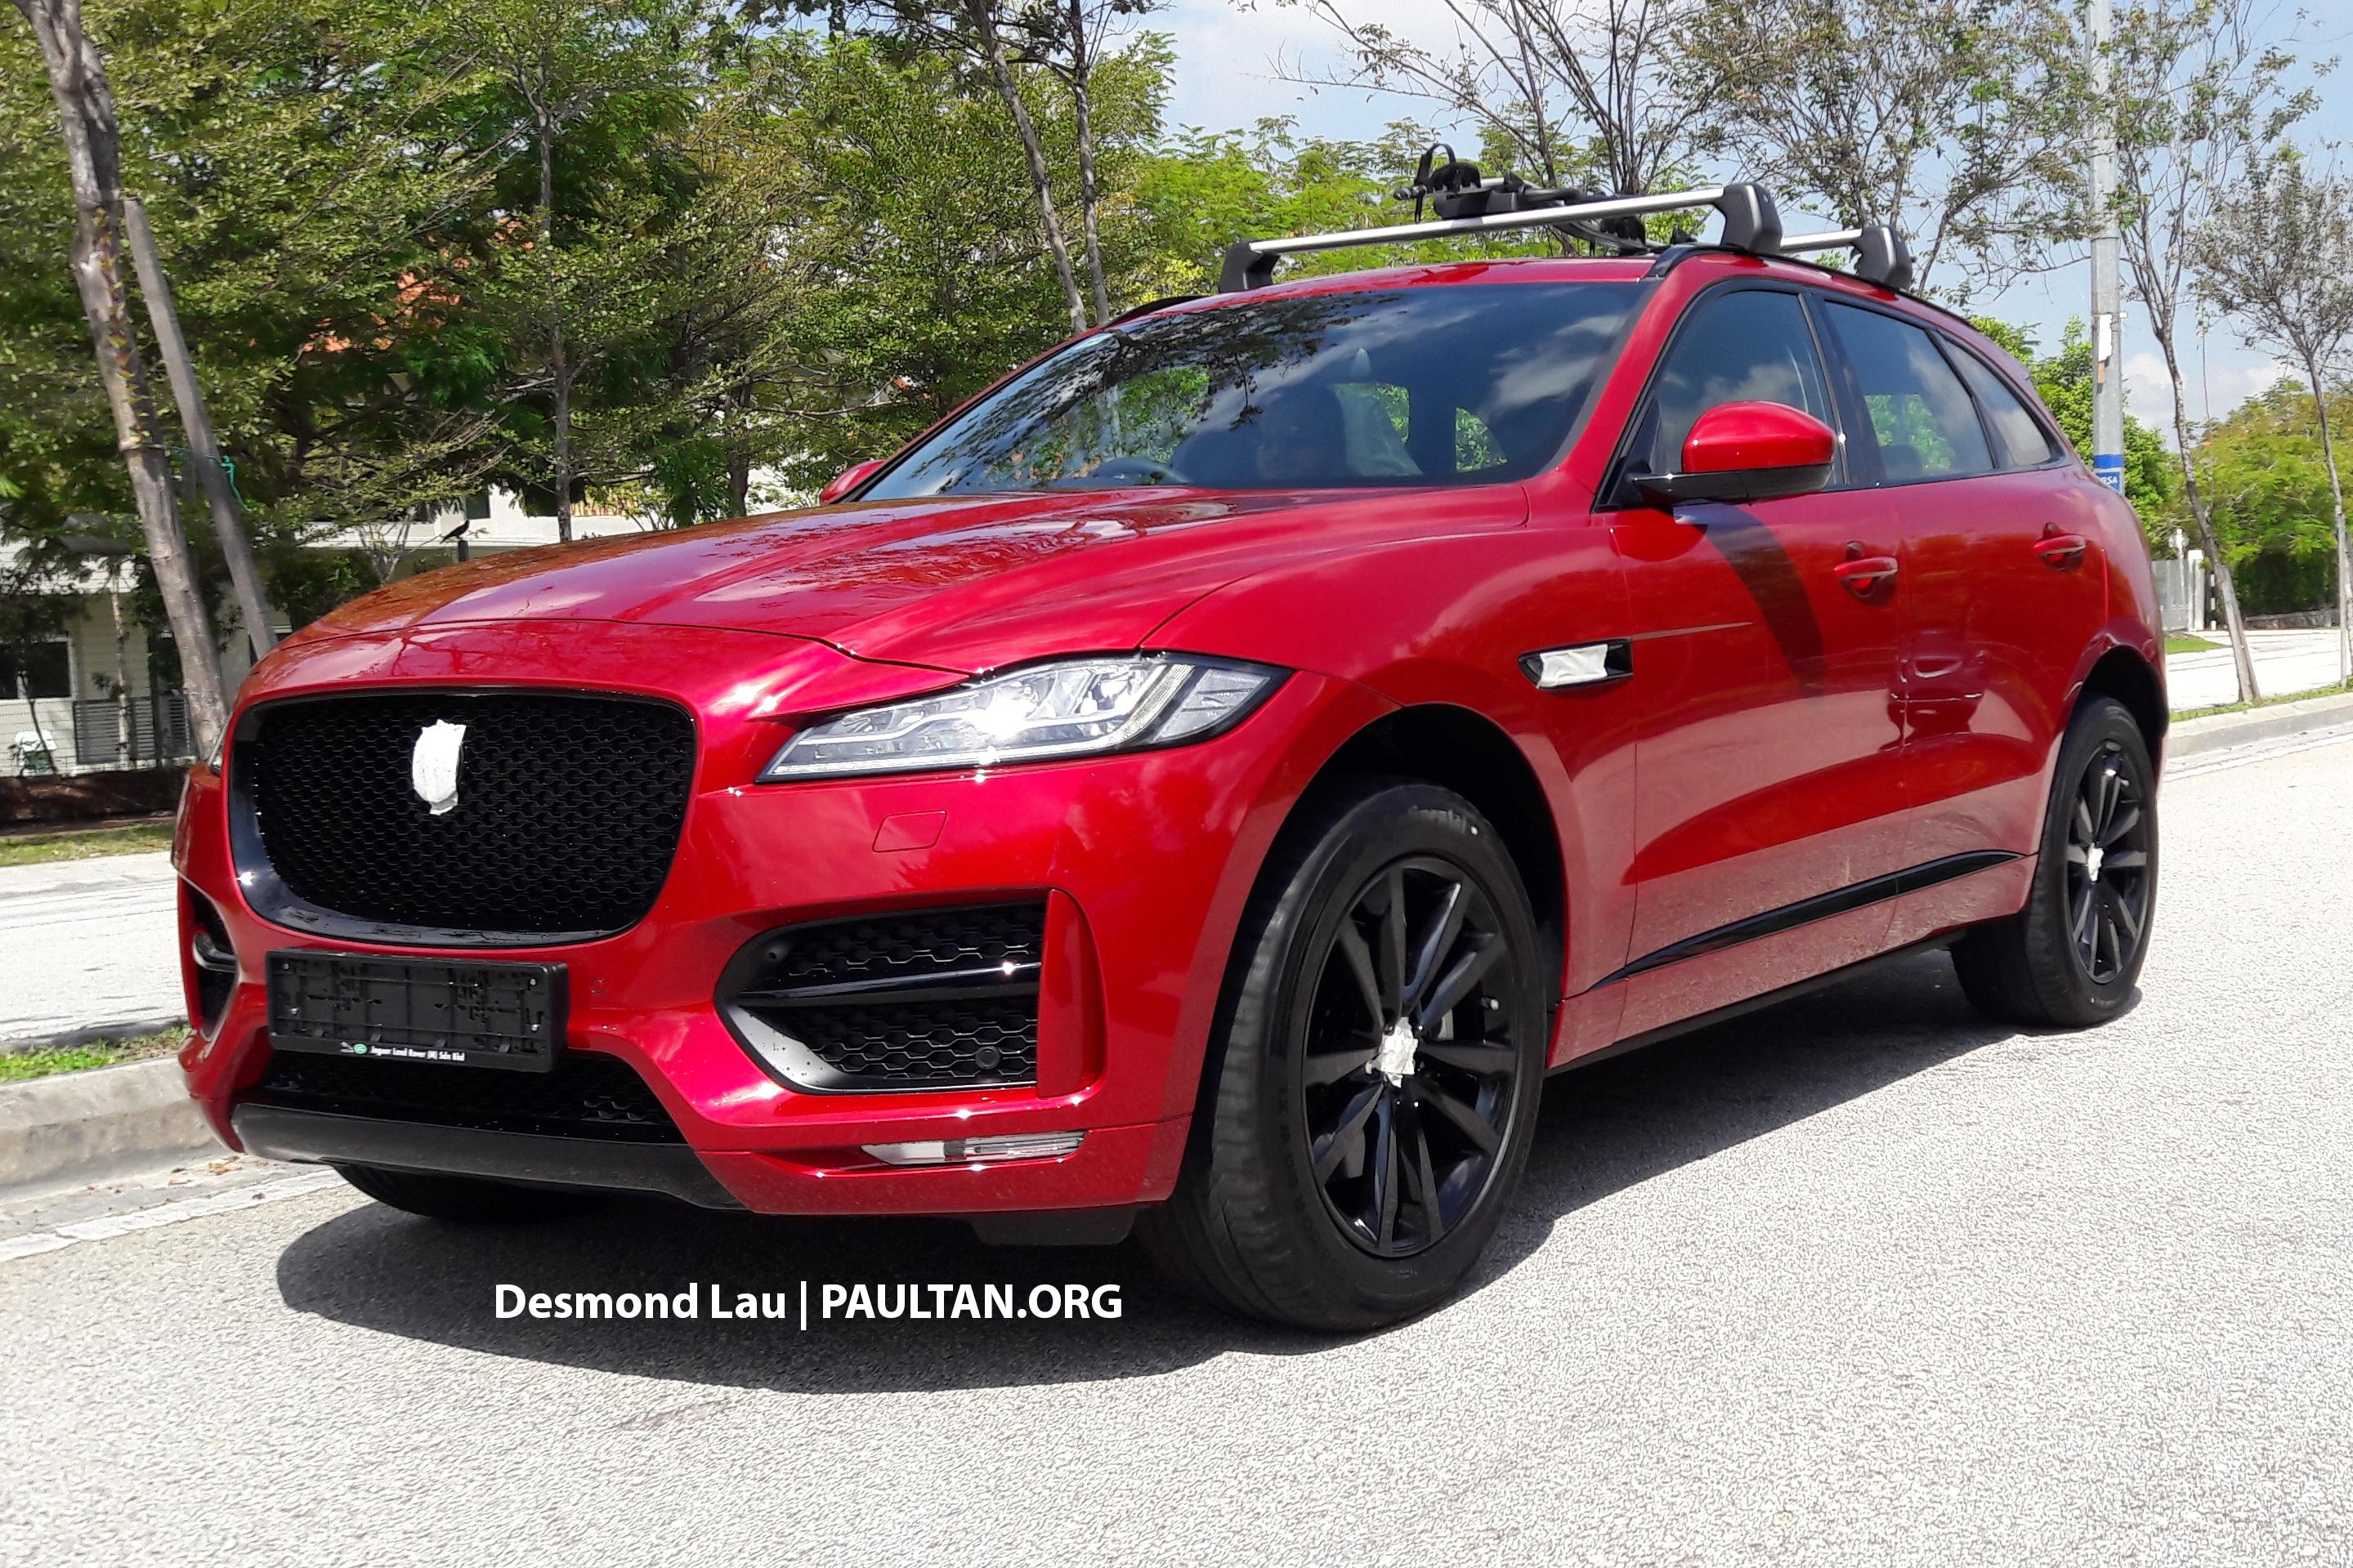 Spyshots Jaguar F Pace In Malaysia 3 0 S C V6